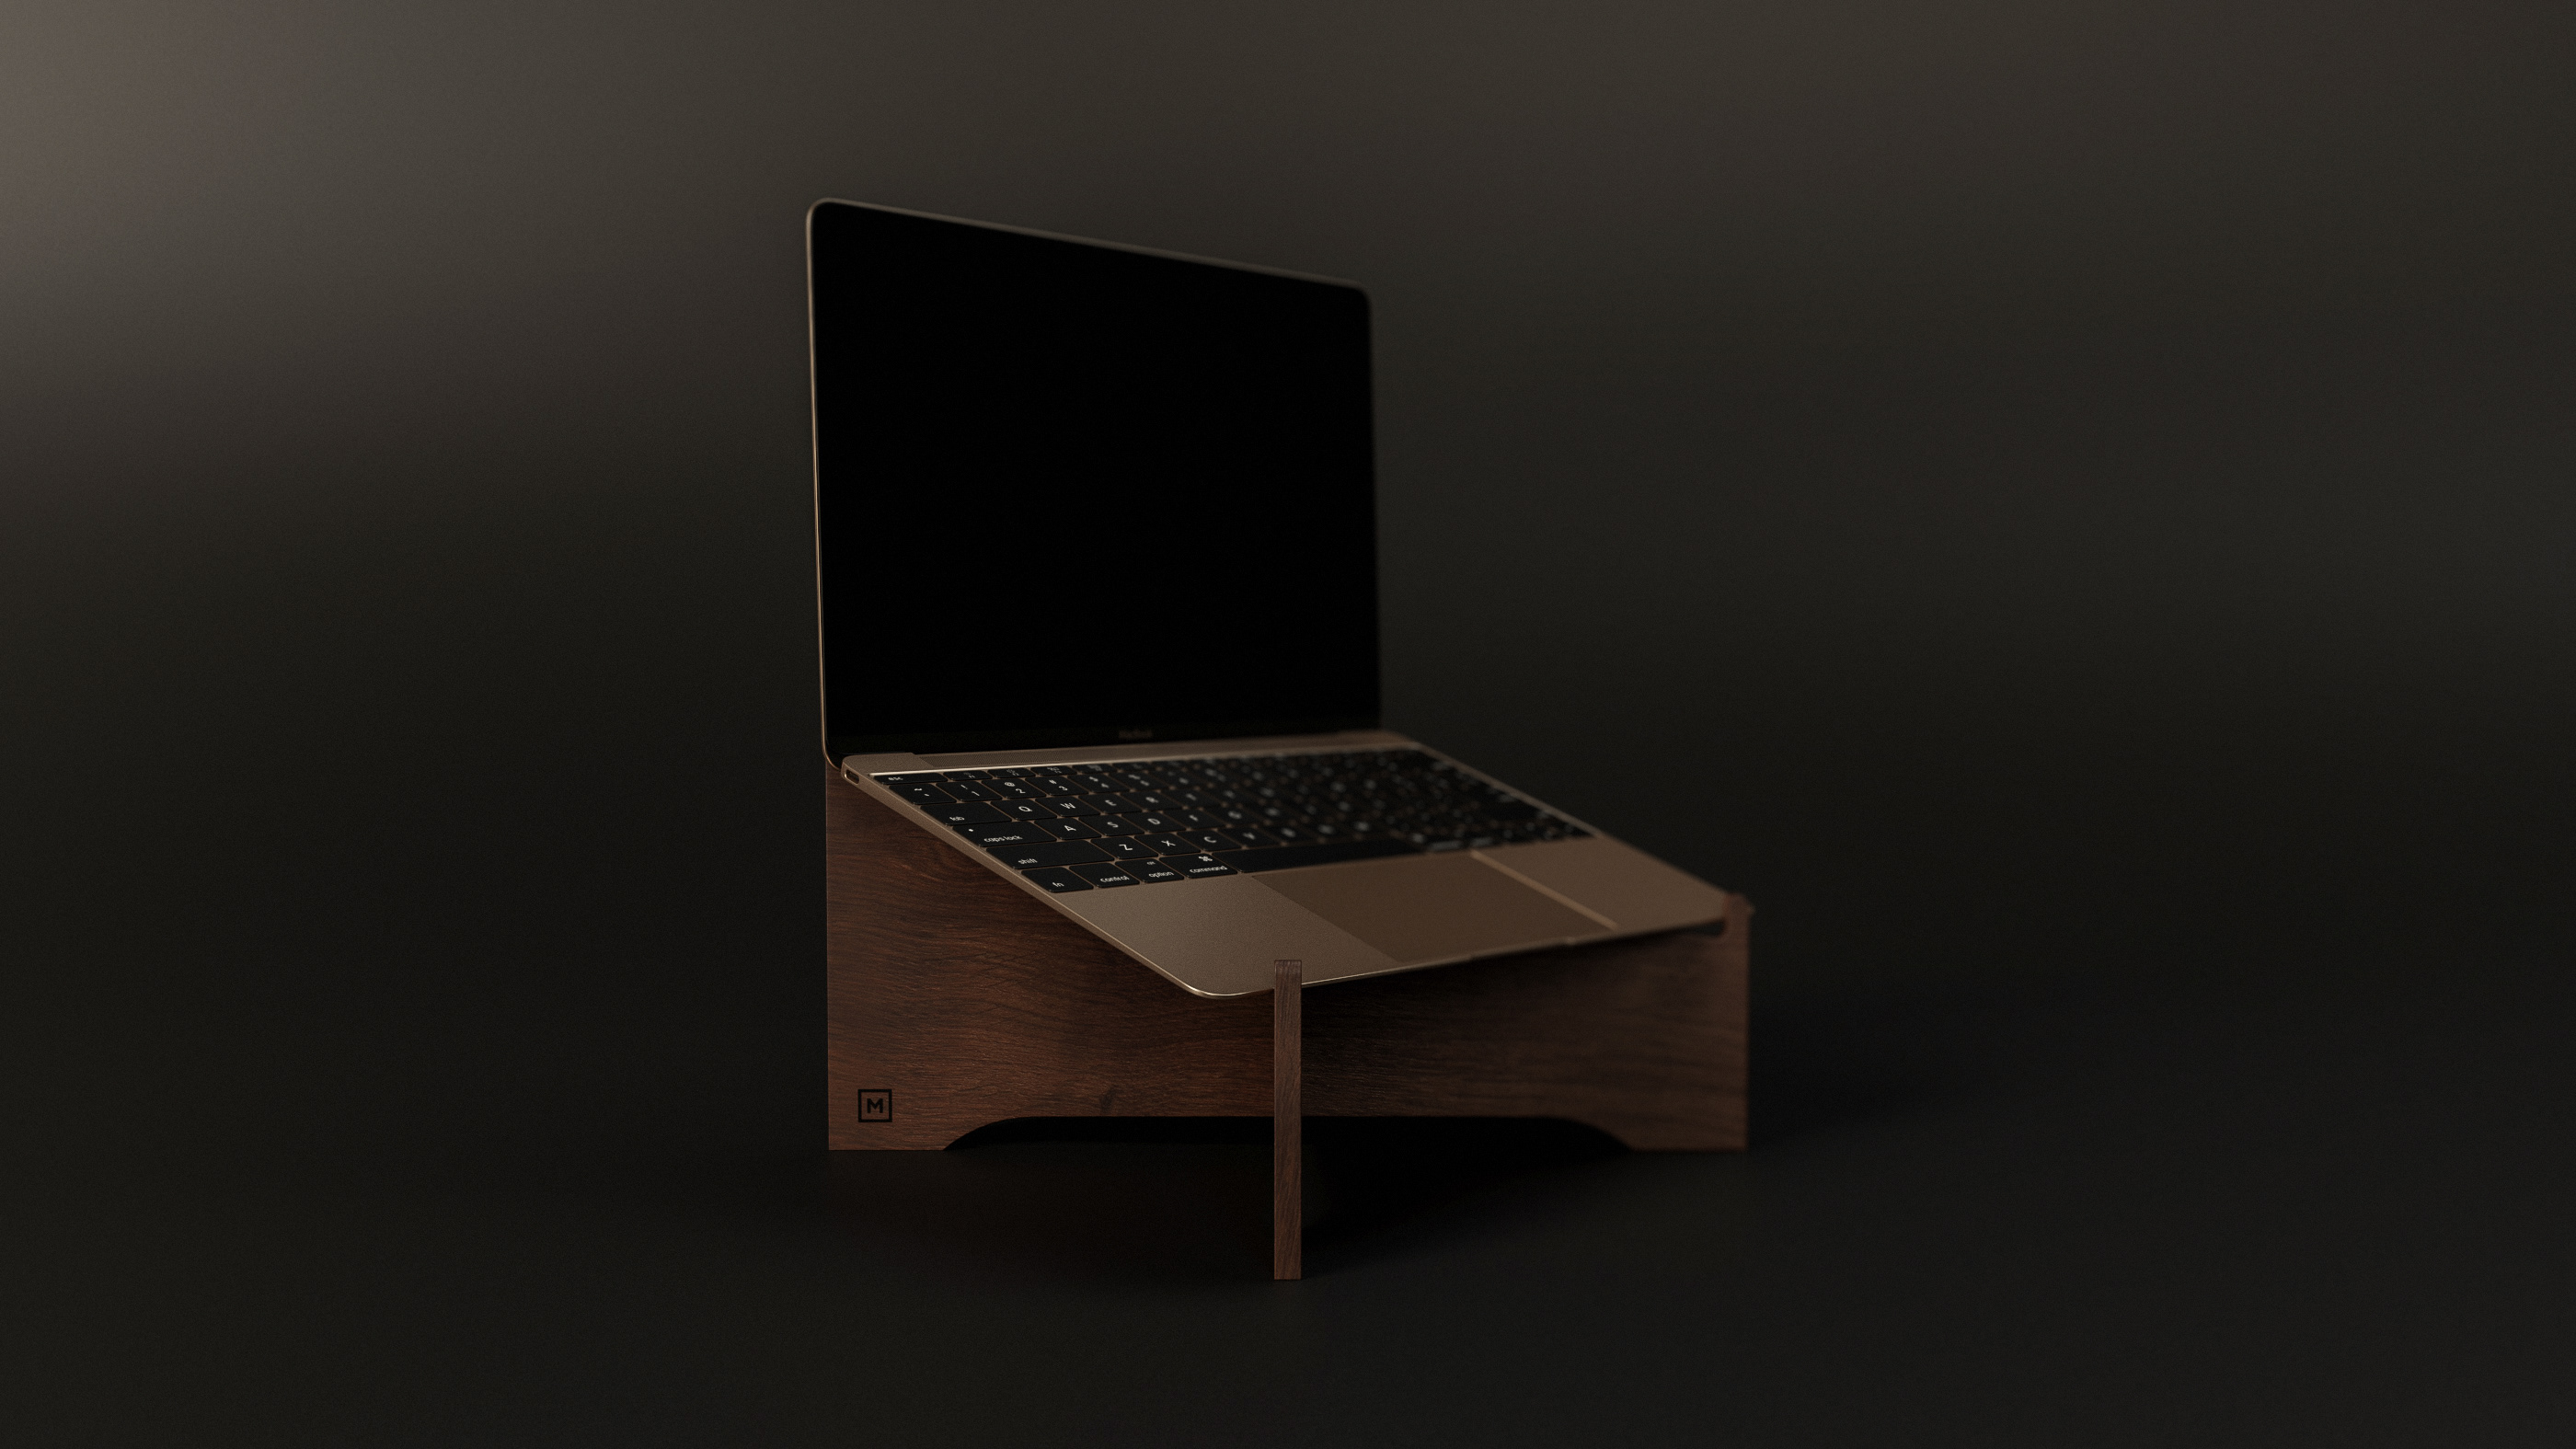 Macbook Stand - 2